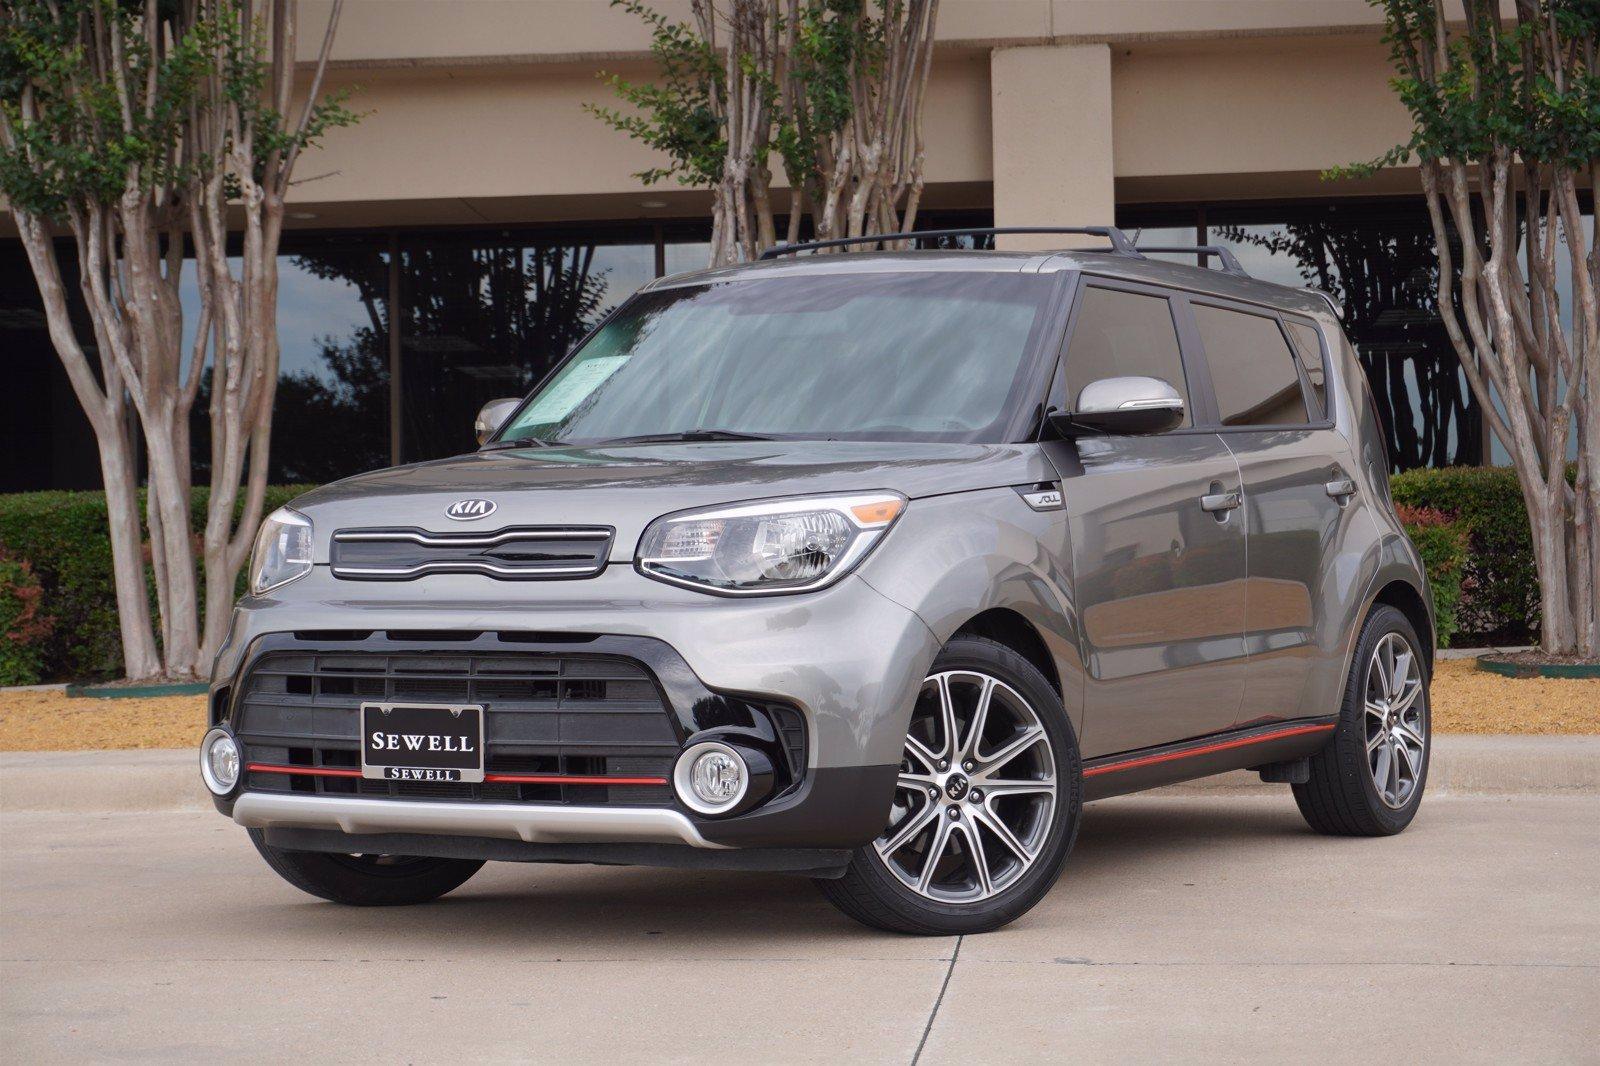 2019 Kia Soul Vehicle Photo in Grapevine, TX 76051